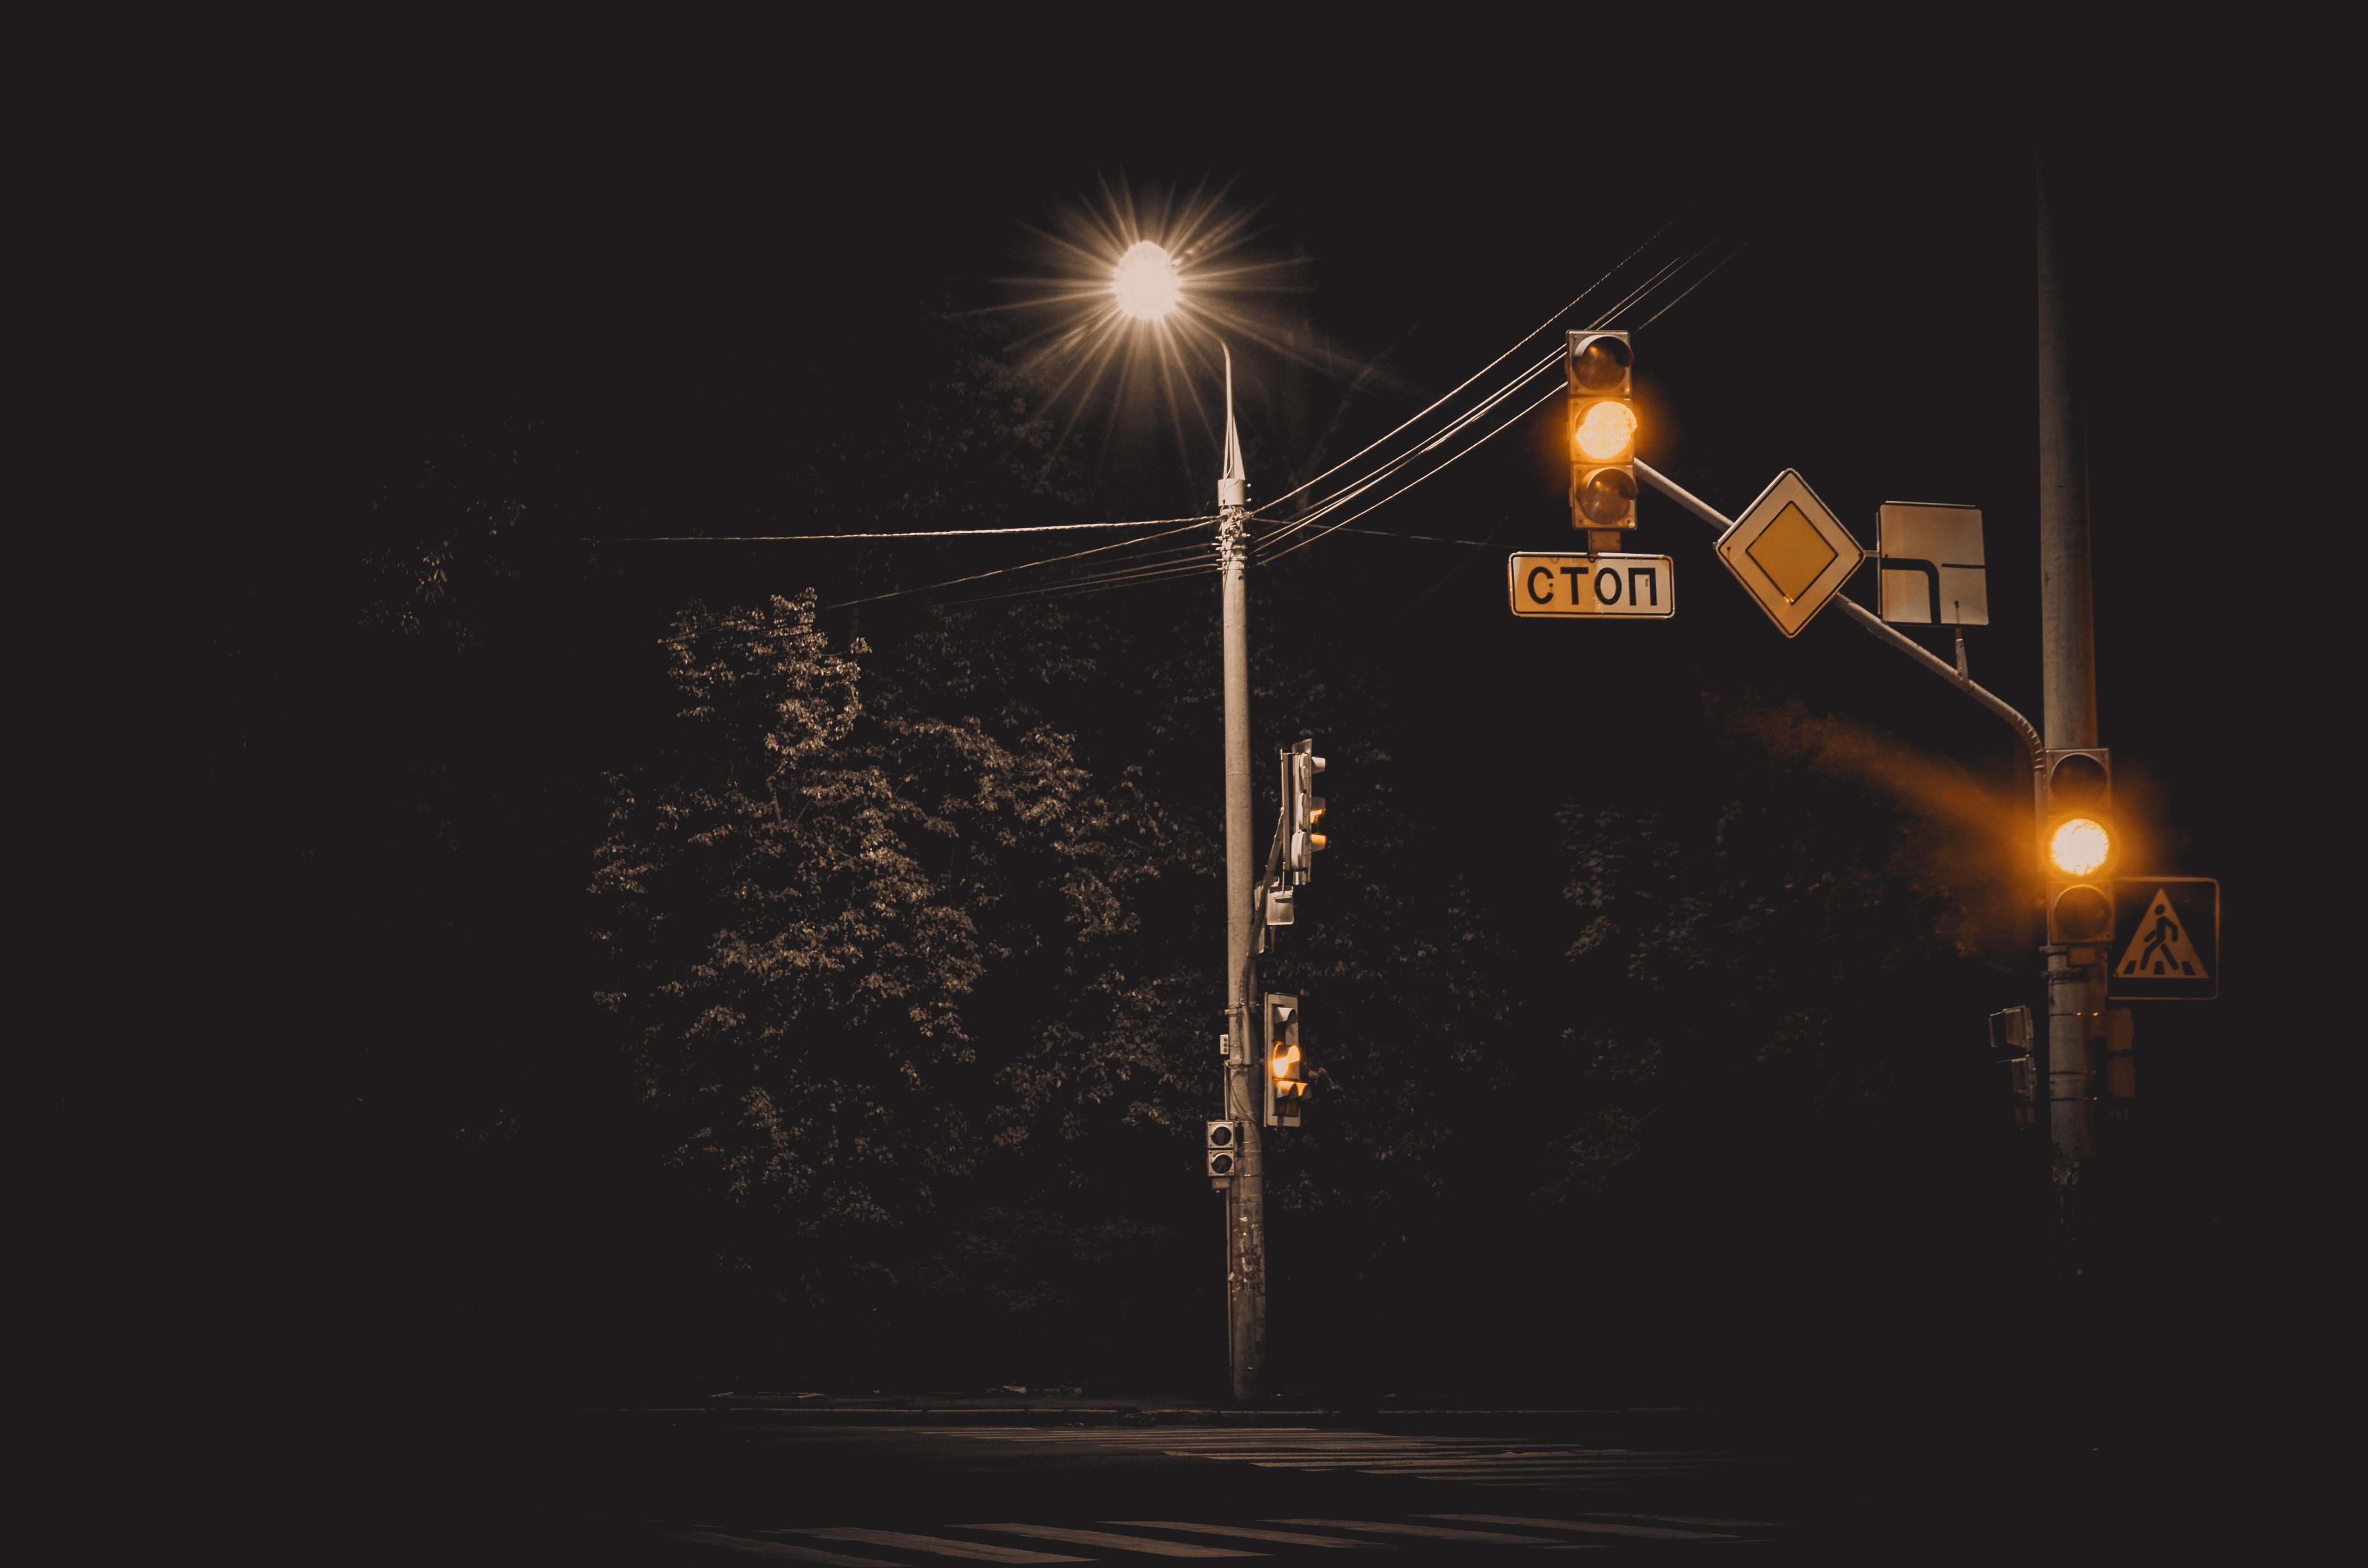 gray street post near green trees during nighttime